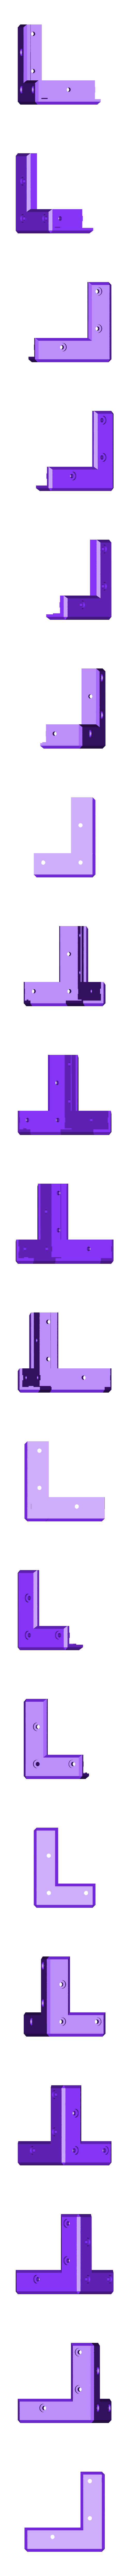 2020-Corner-Long.stl Download free STL file 2020 Profile Aluminum 3D Printable Erector Set • 3D printer model, adamjvr